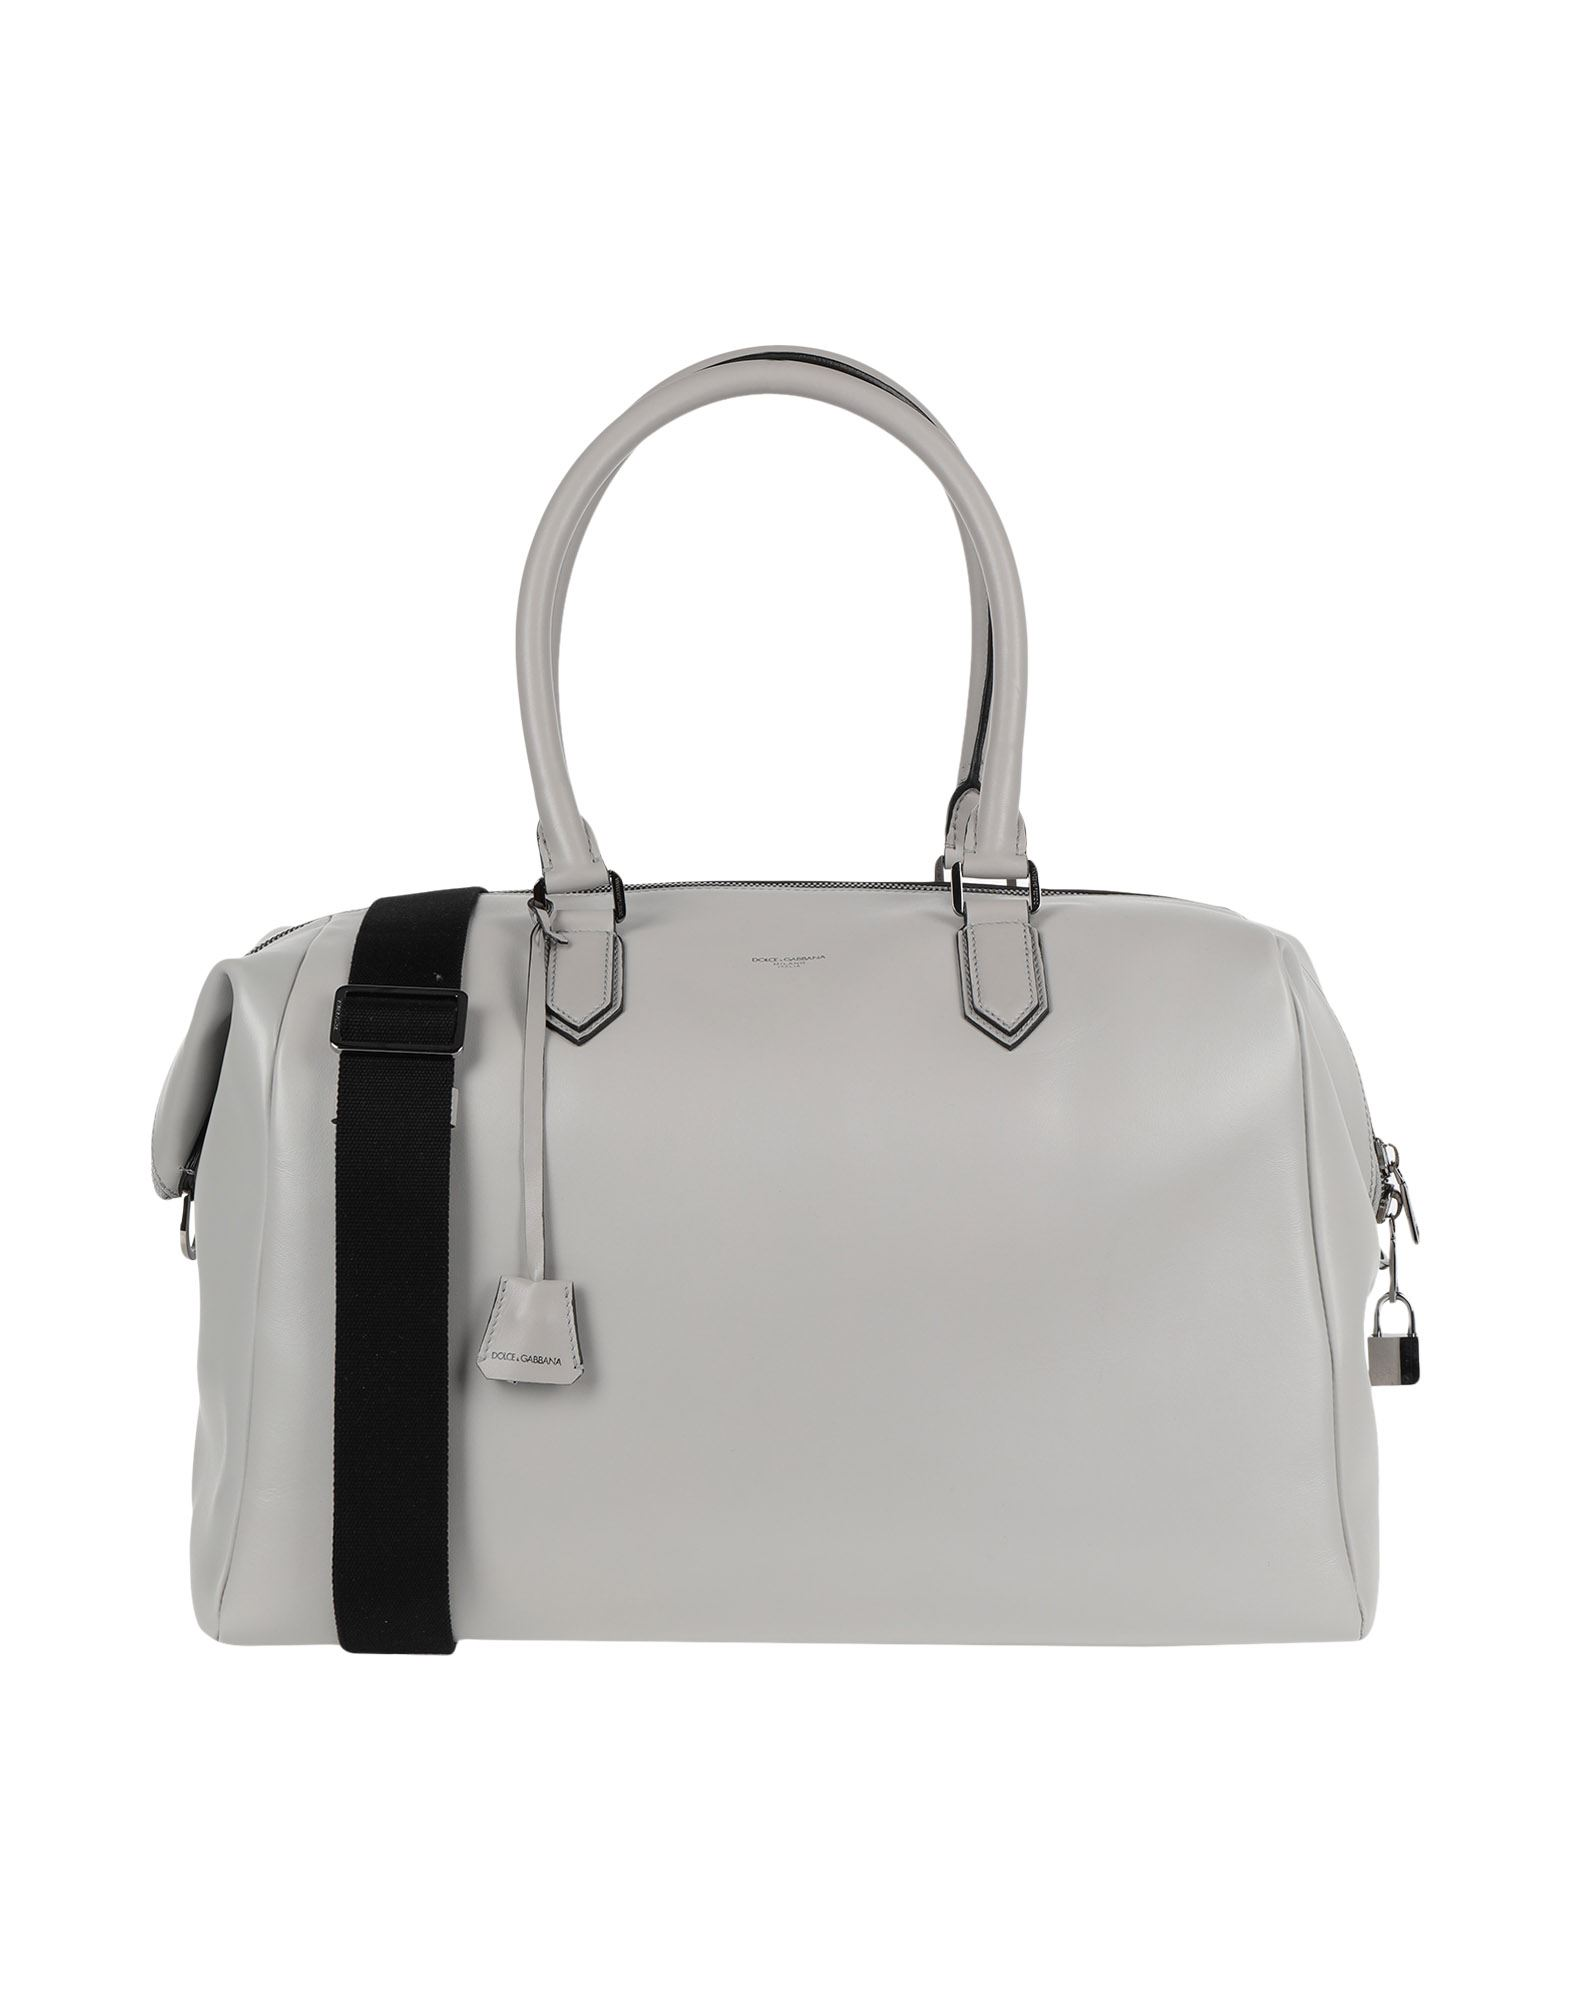 DOLCE & GABBANA Travel duffel bags - Item 55020749